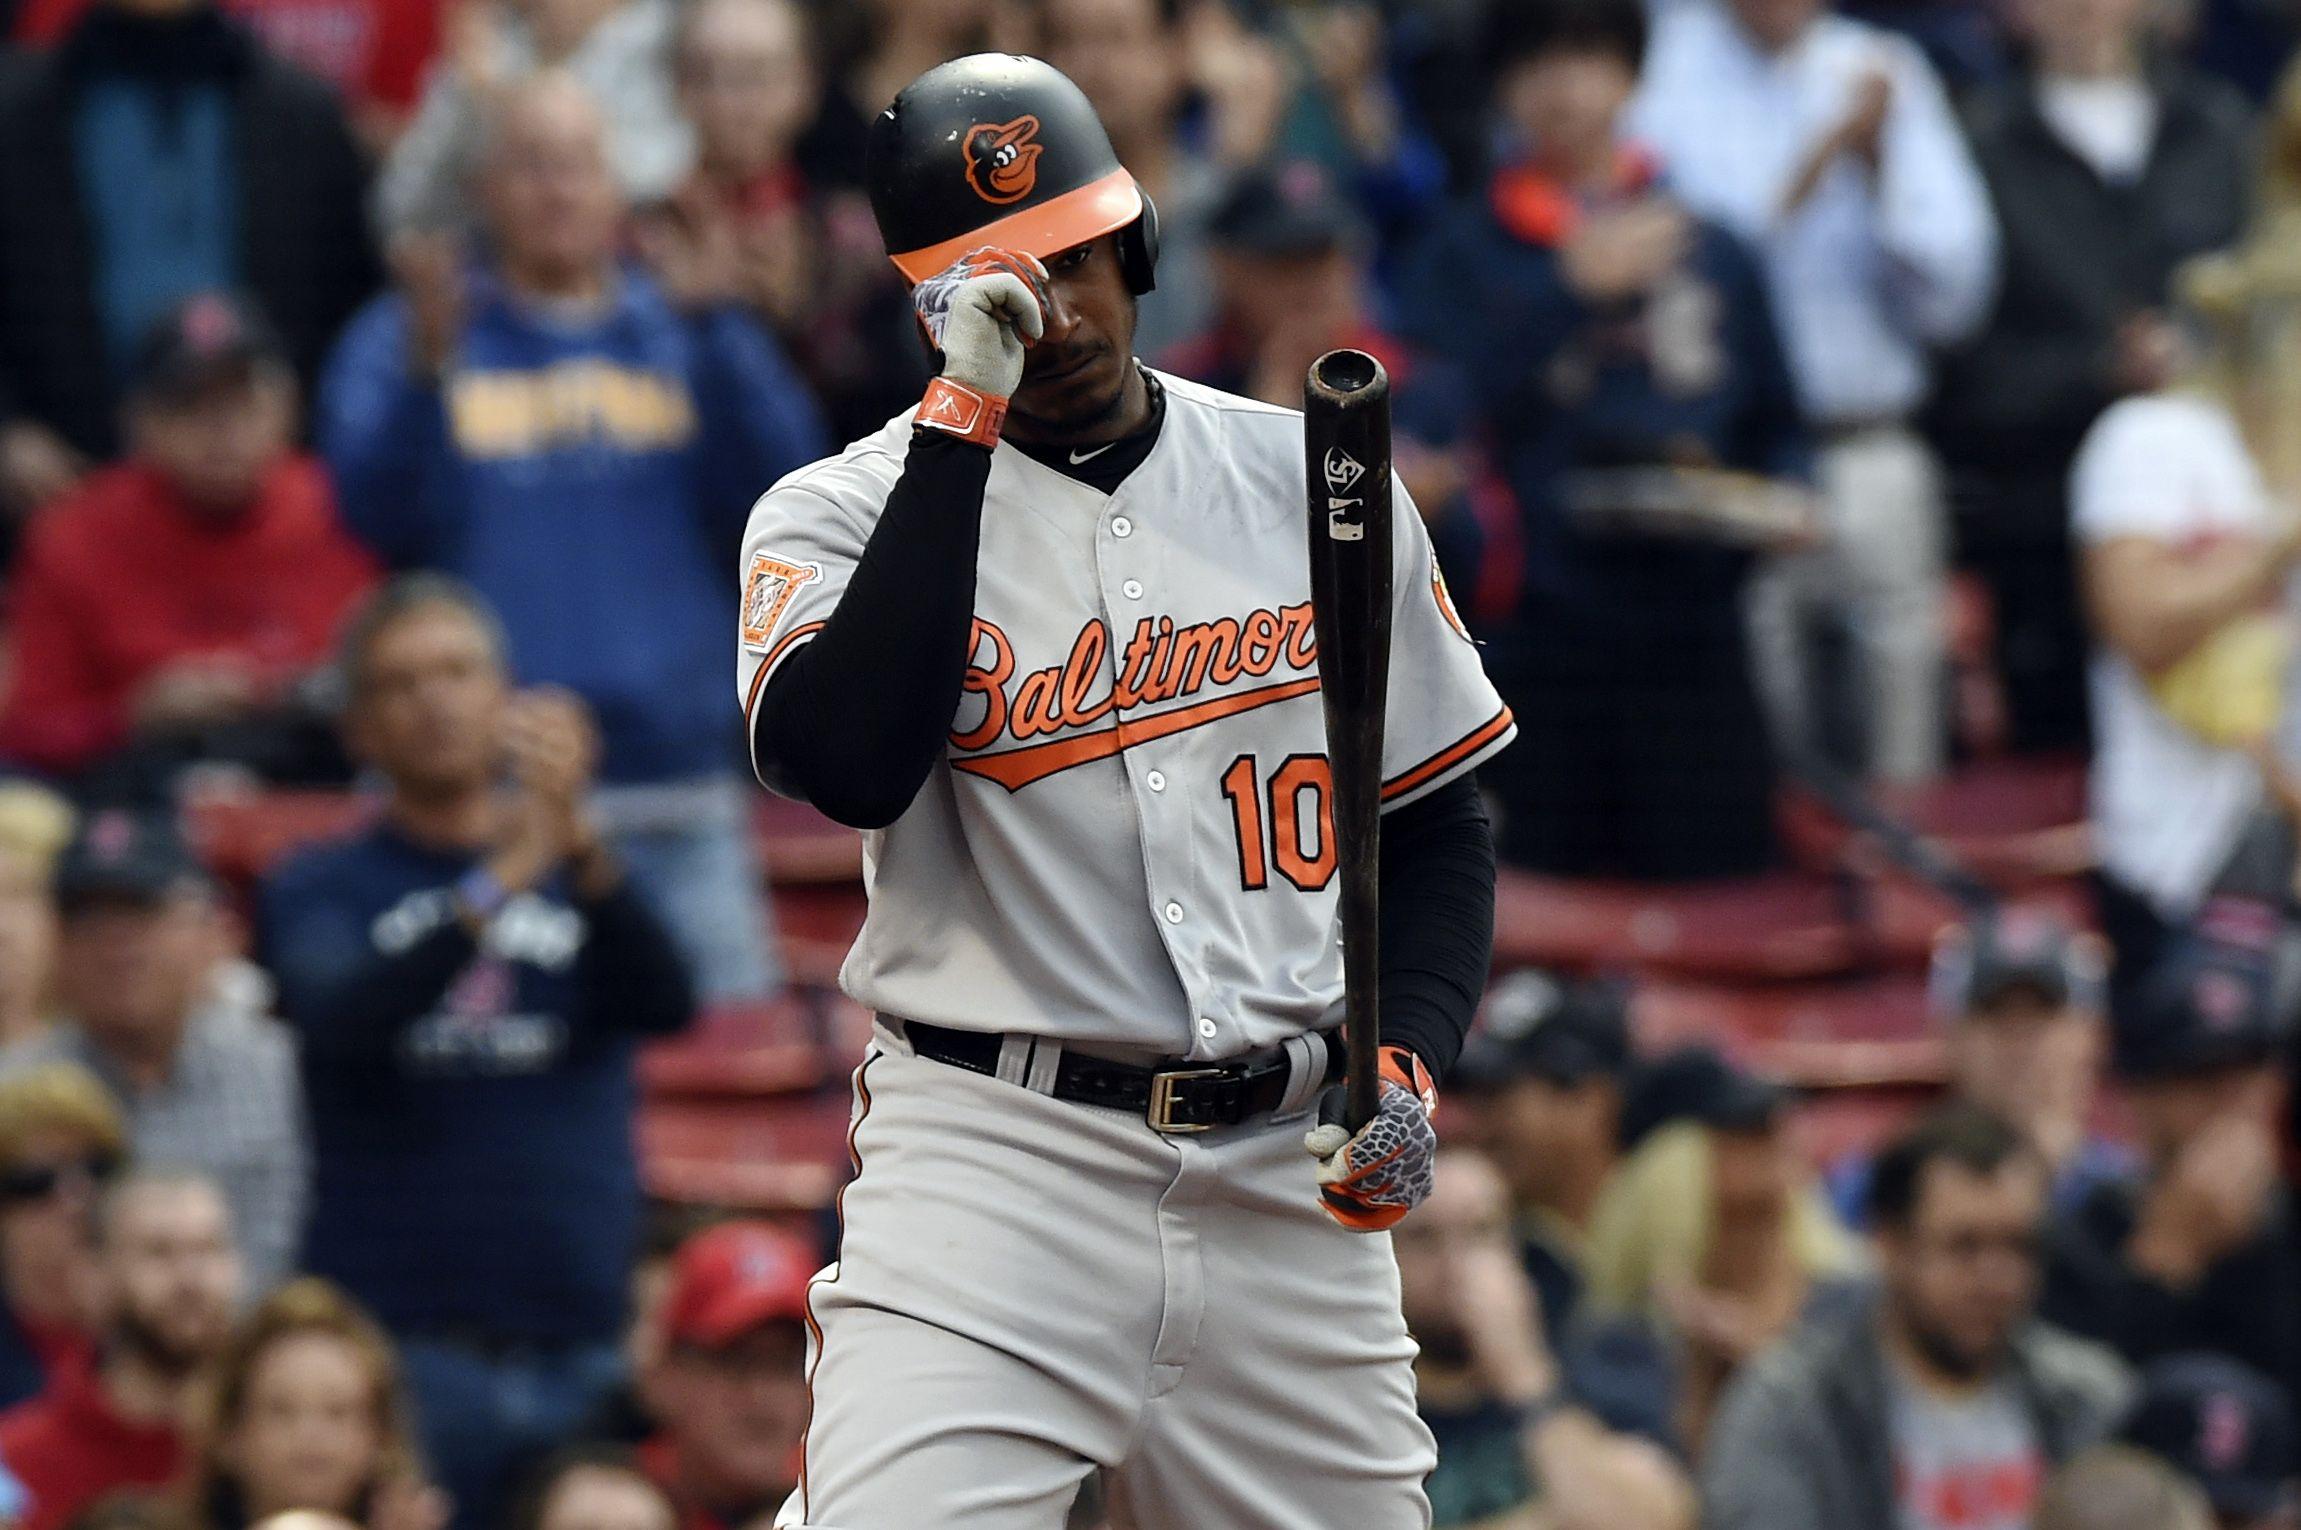 Baltimore Orioles center fielder Adam Jones at Fenway Park, Boston, May 2.